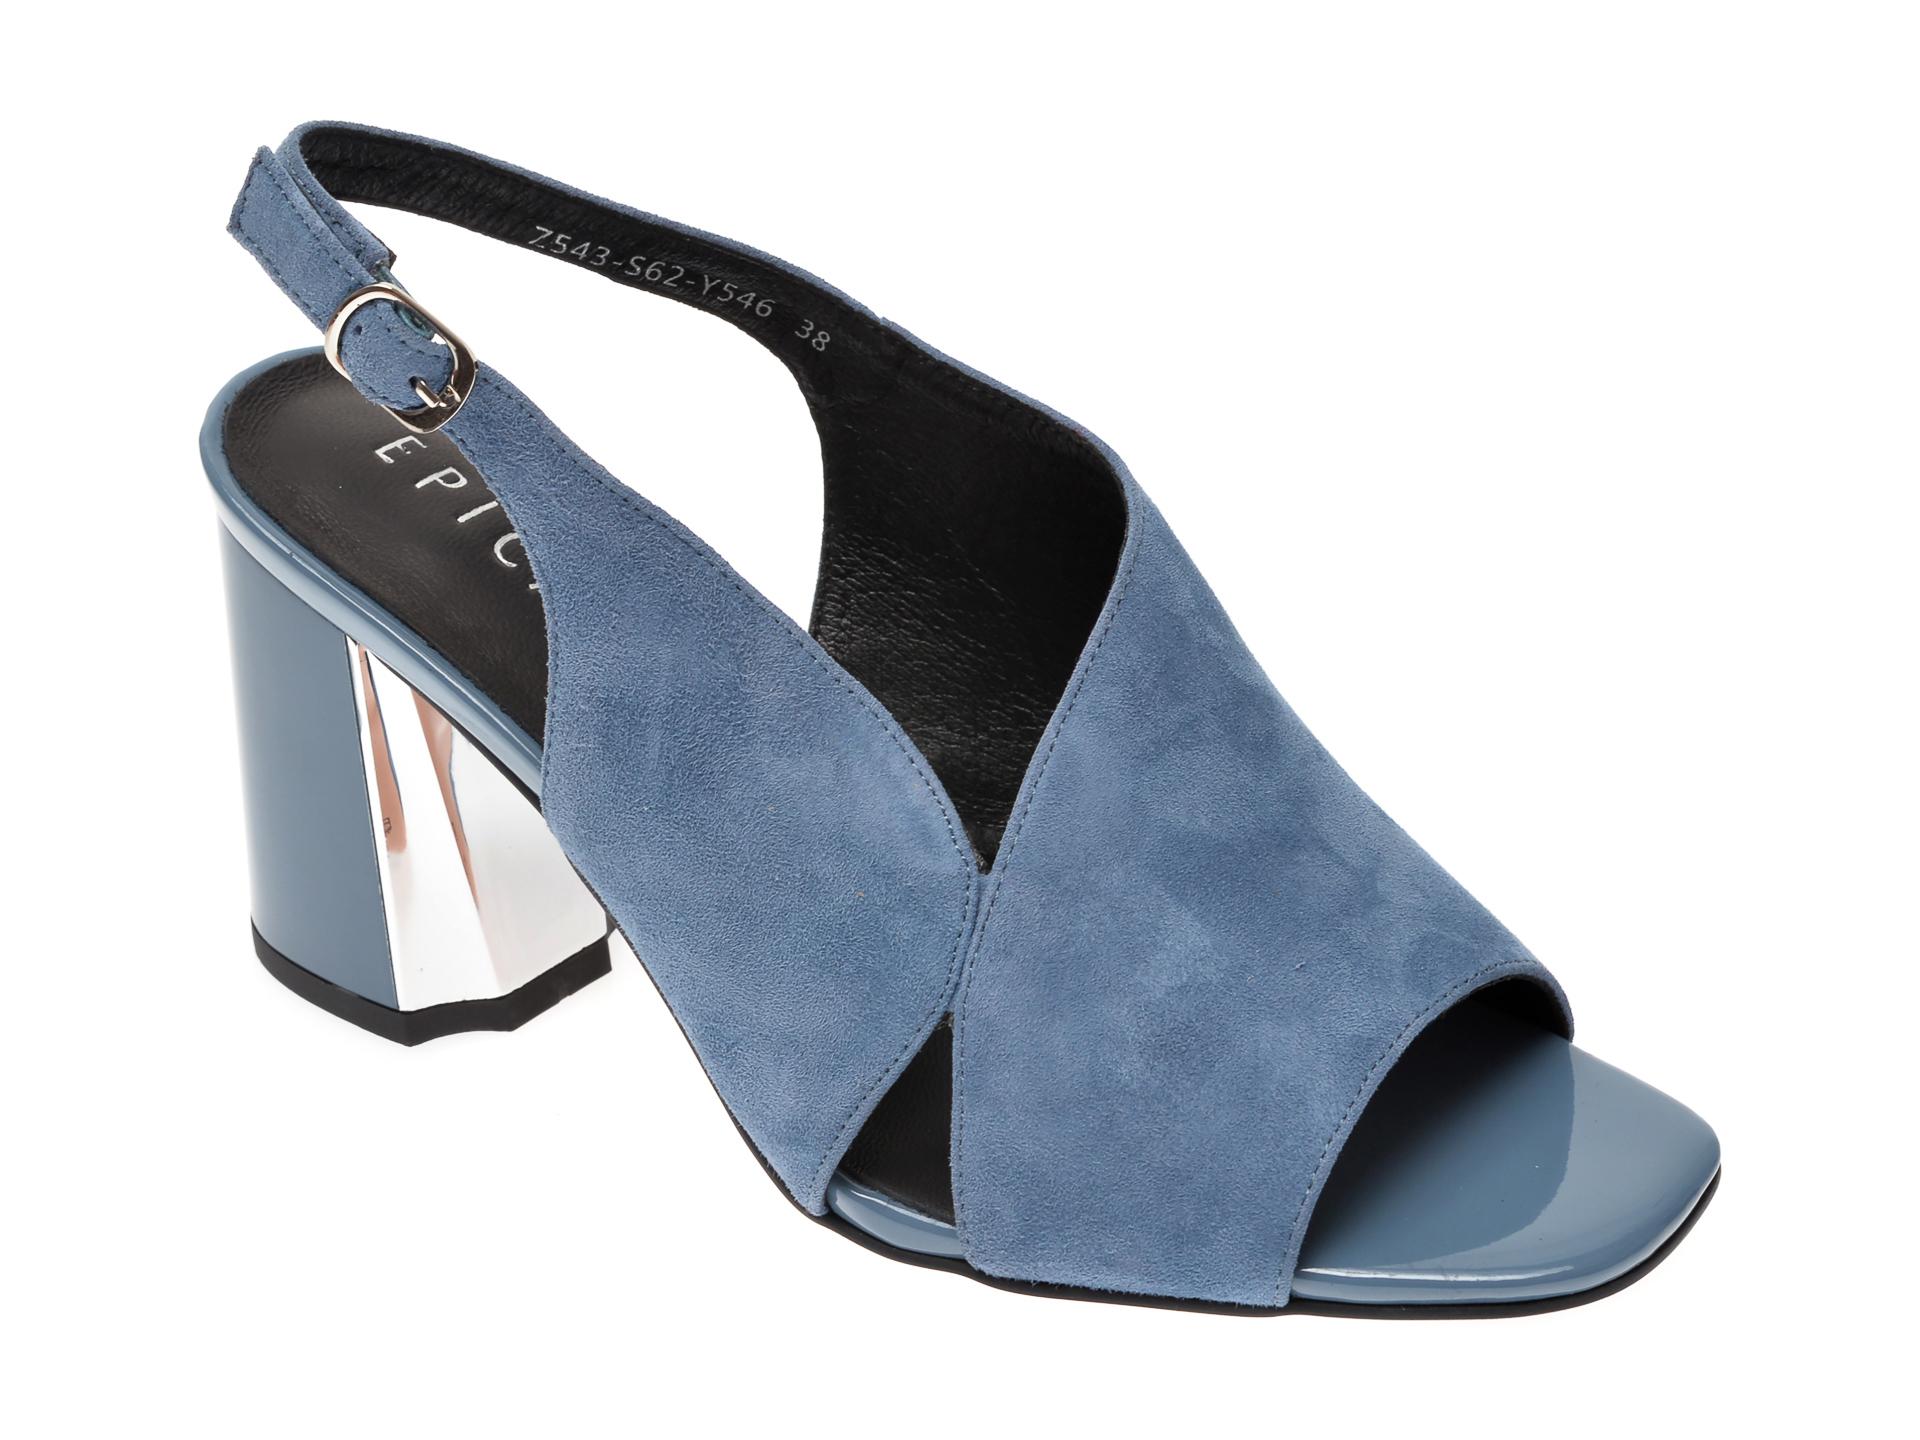 Sandale EPICA albastre, Z543S62, din piele intoarsa